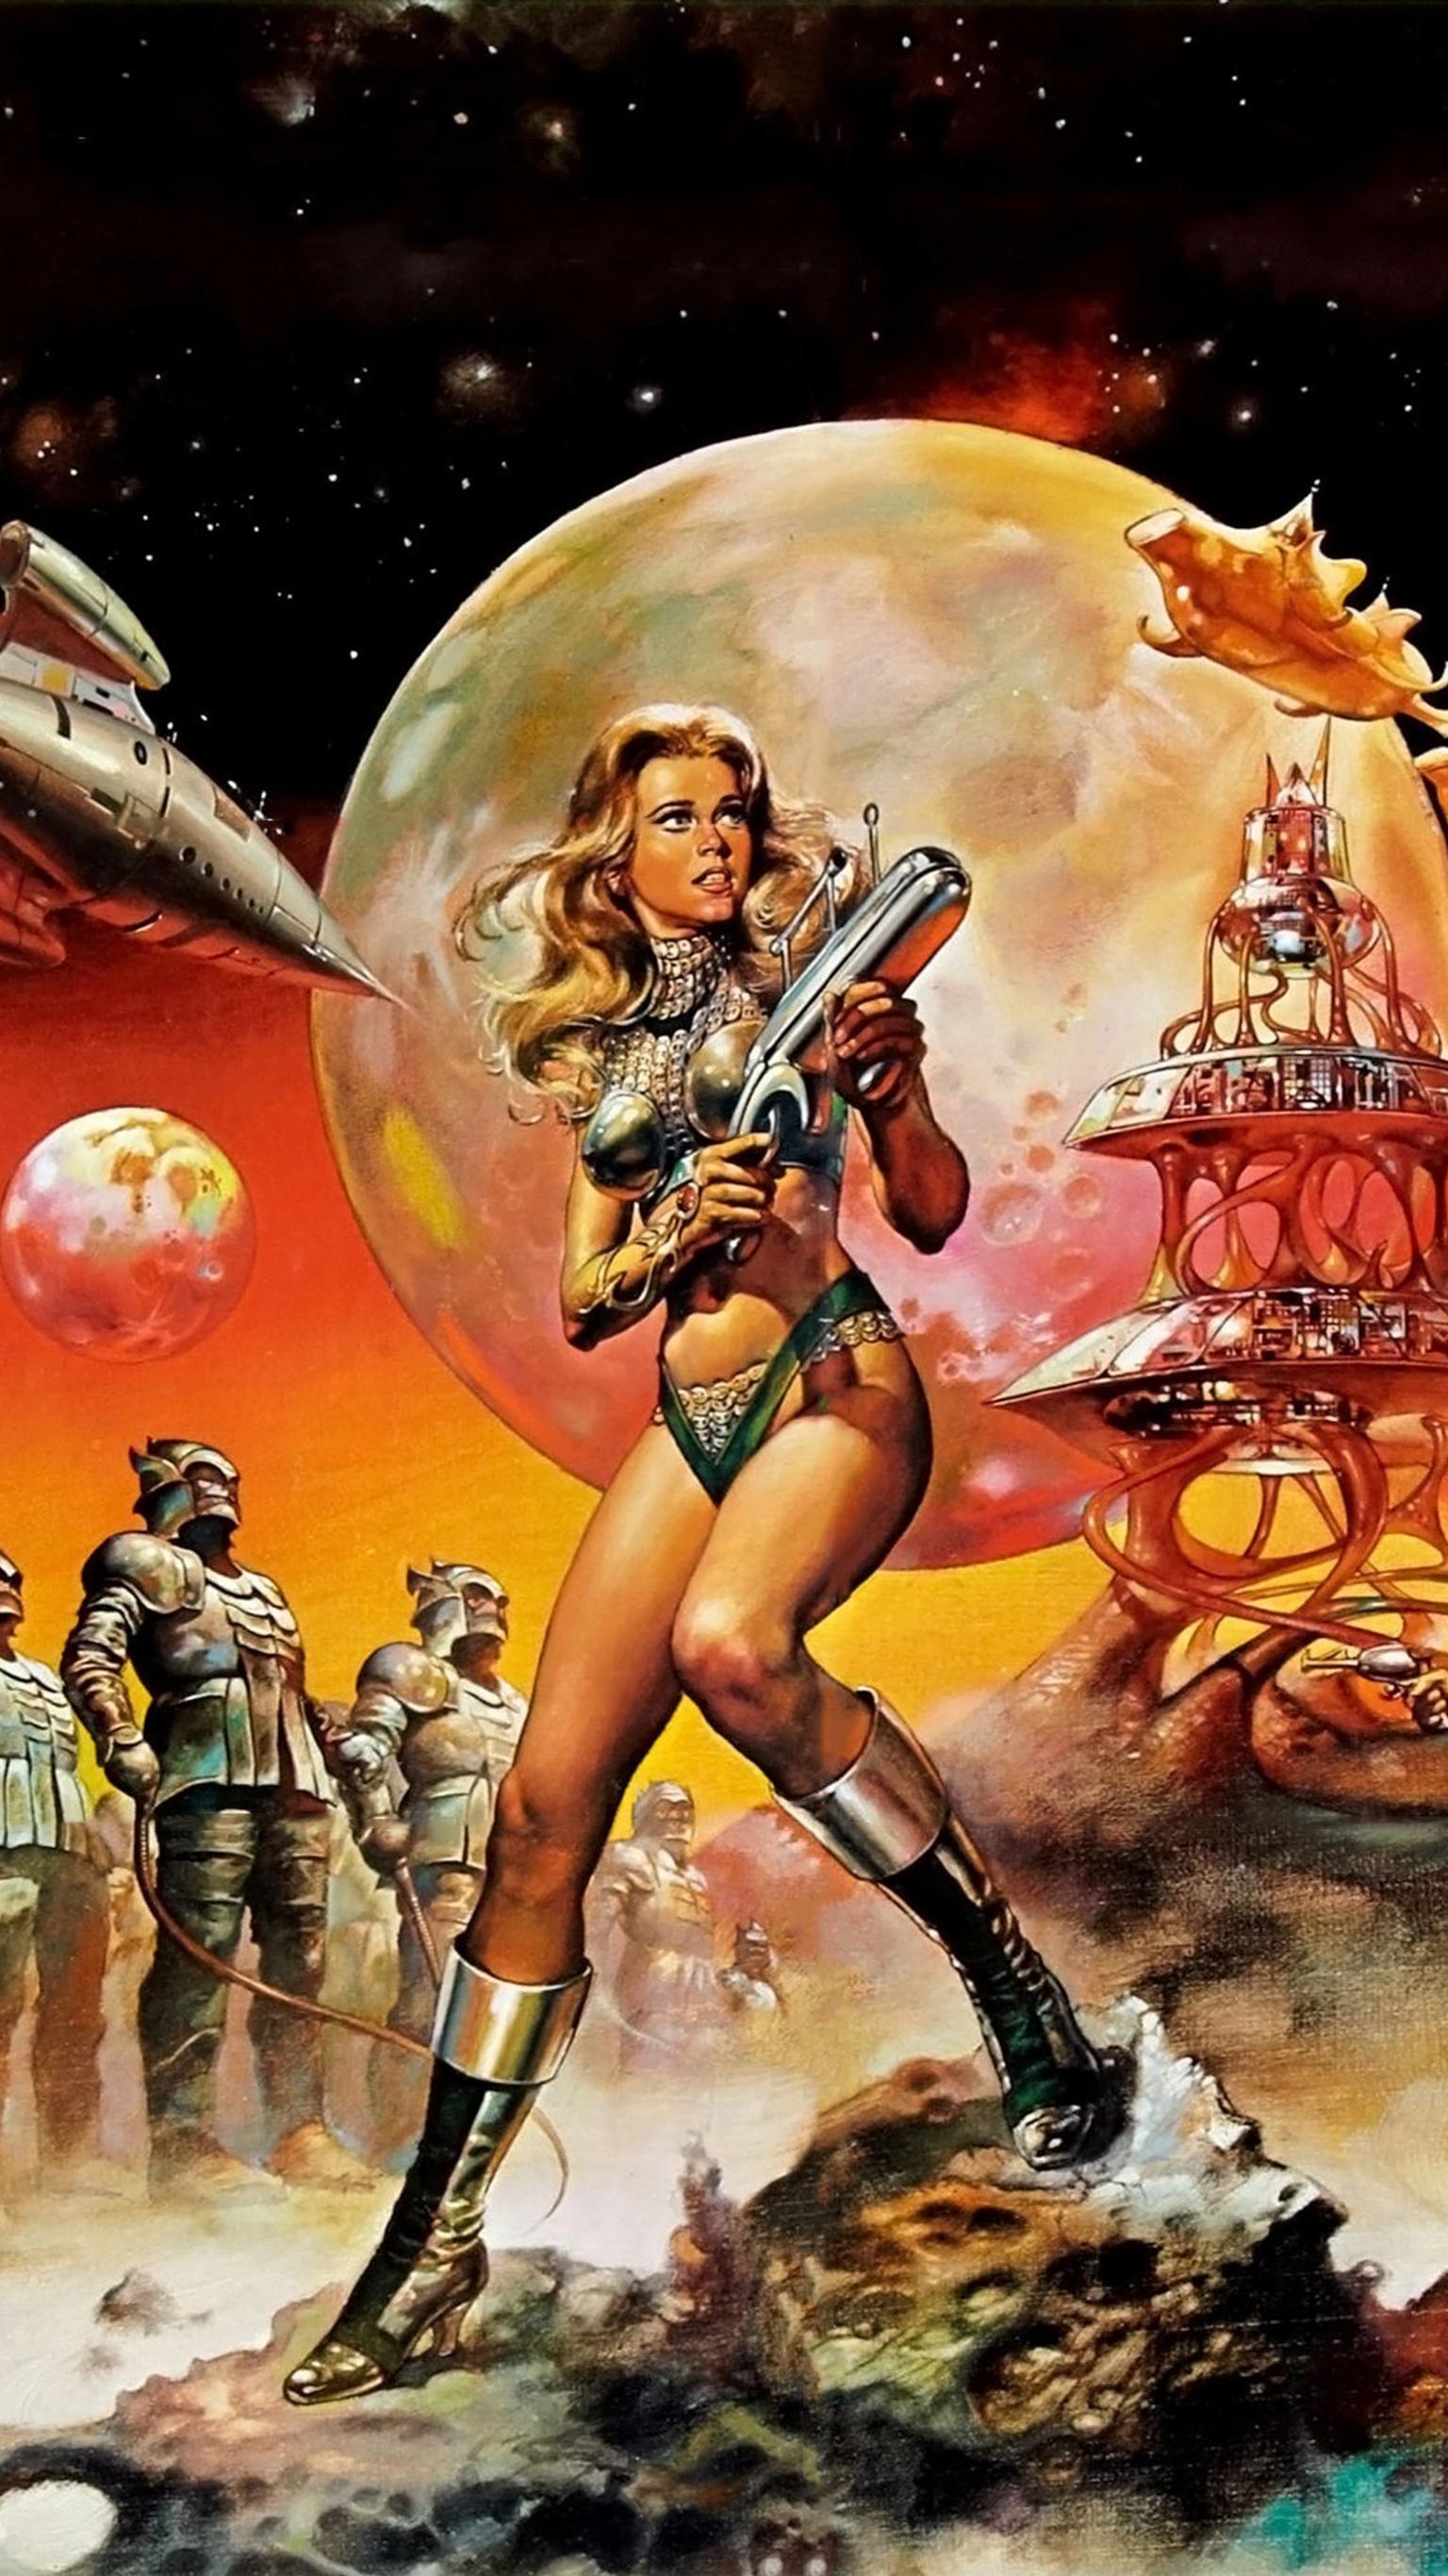 Barbarella 1968 Phone Wallpaper Moviemania In 2020 Science Fiction Art Pulp Fiction Art Retro Futurism